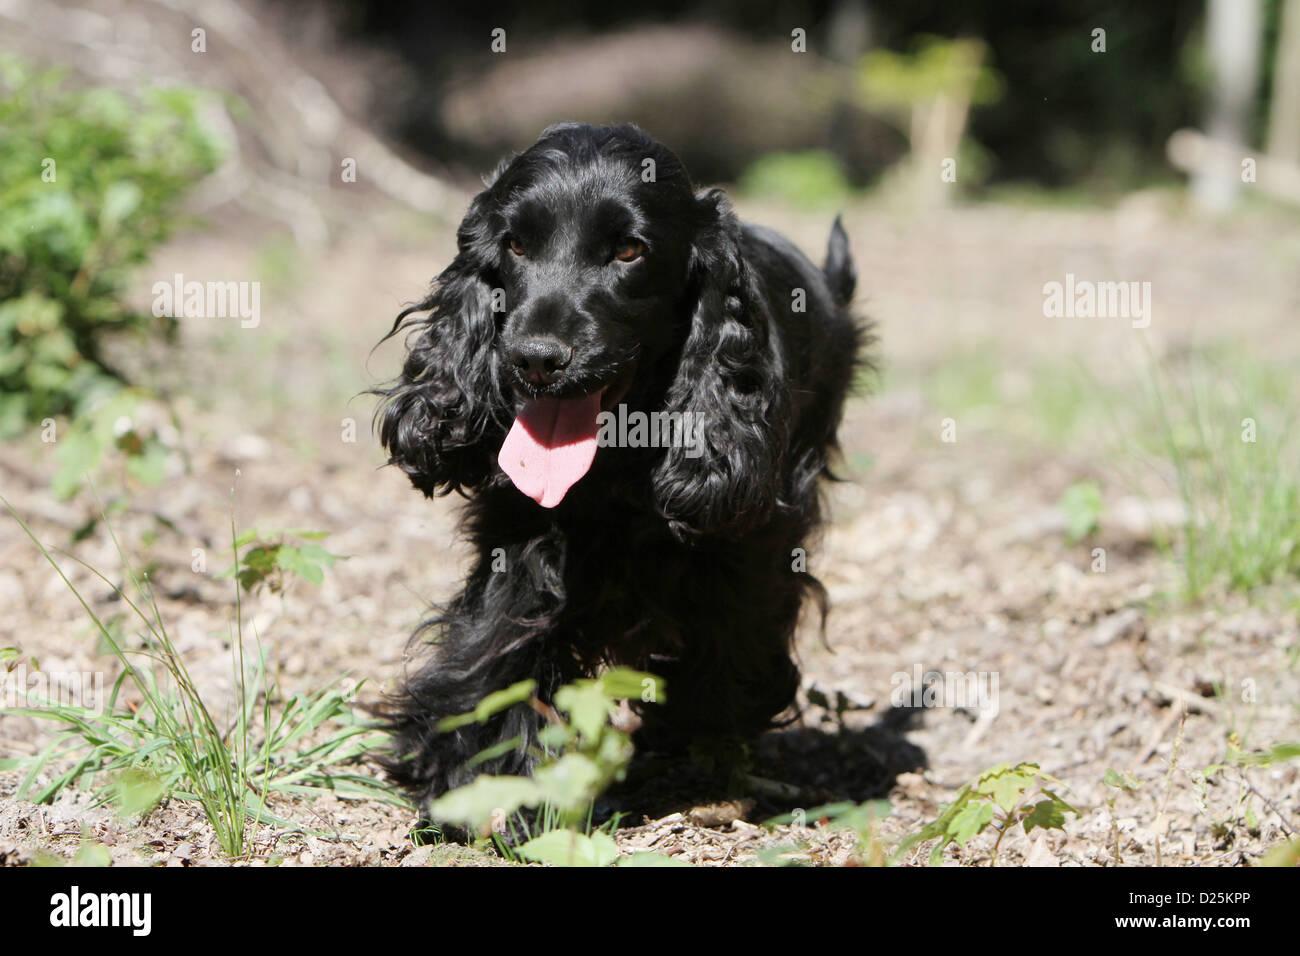 dog english cocker spaniel adult black running in a